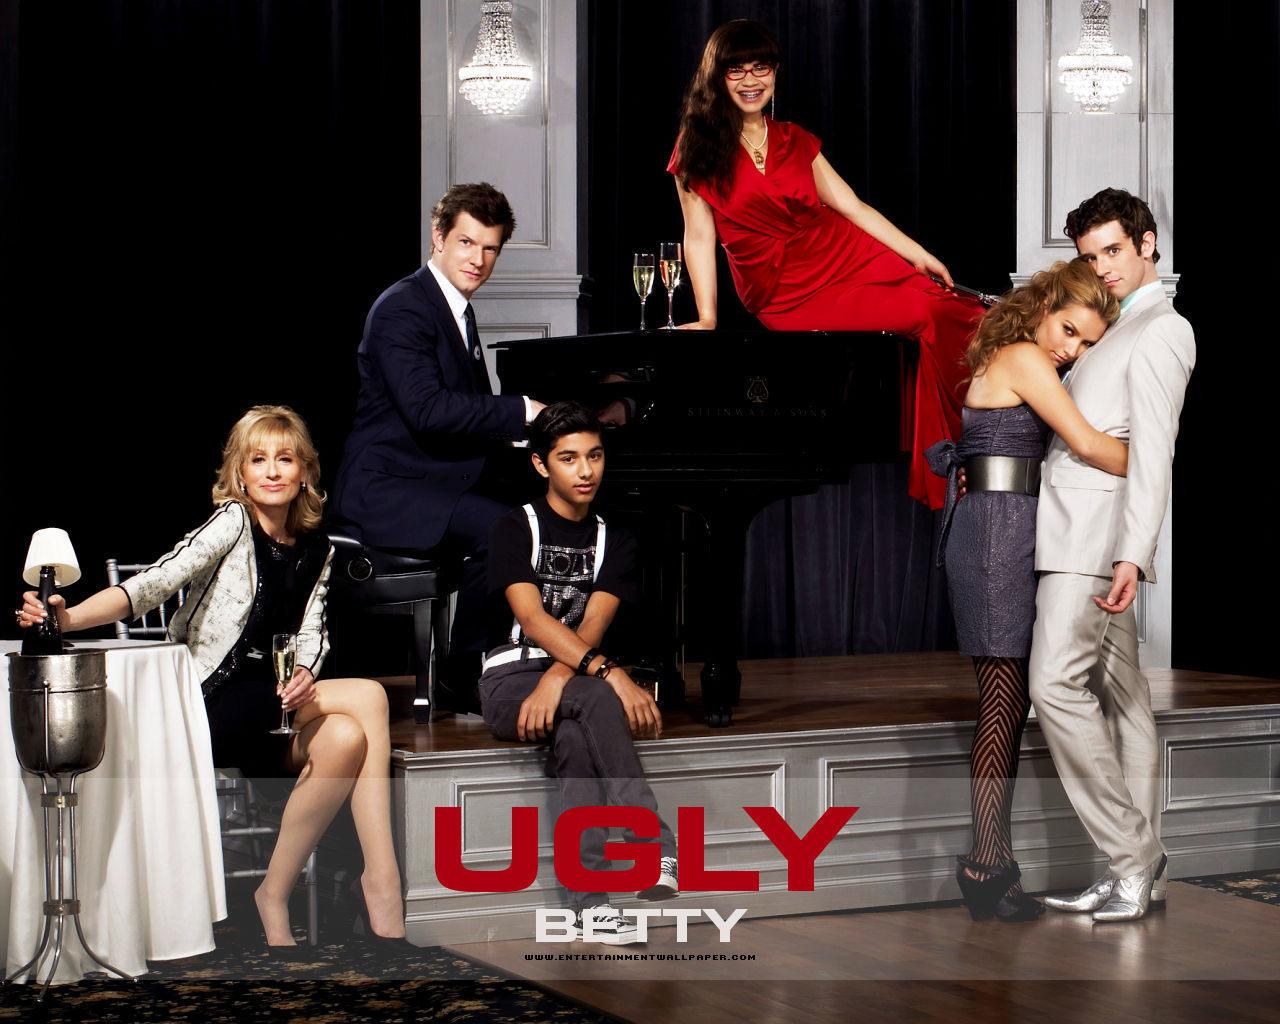 http://1.bp.blogspot.com/-dHBtAZAgKG4/TWfXSzPLVfI/AAAAAAAAADY/Q7iwLm6TmNQ/s1600/Ugly-Betty-ugly-betty-2966065-1280-1024.jpg